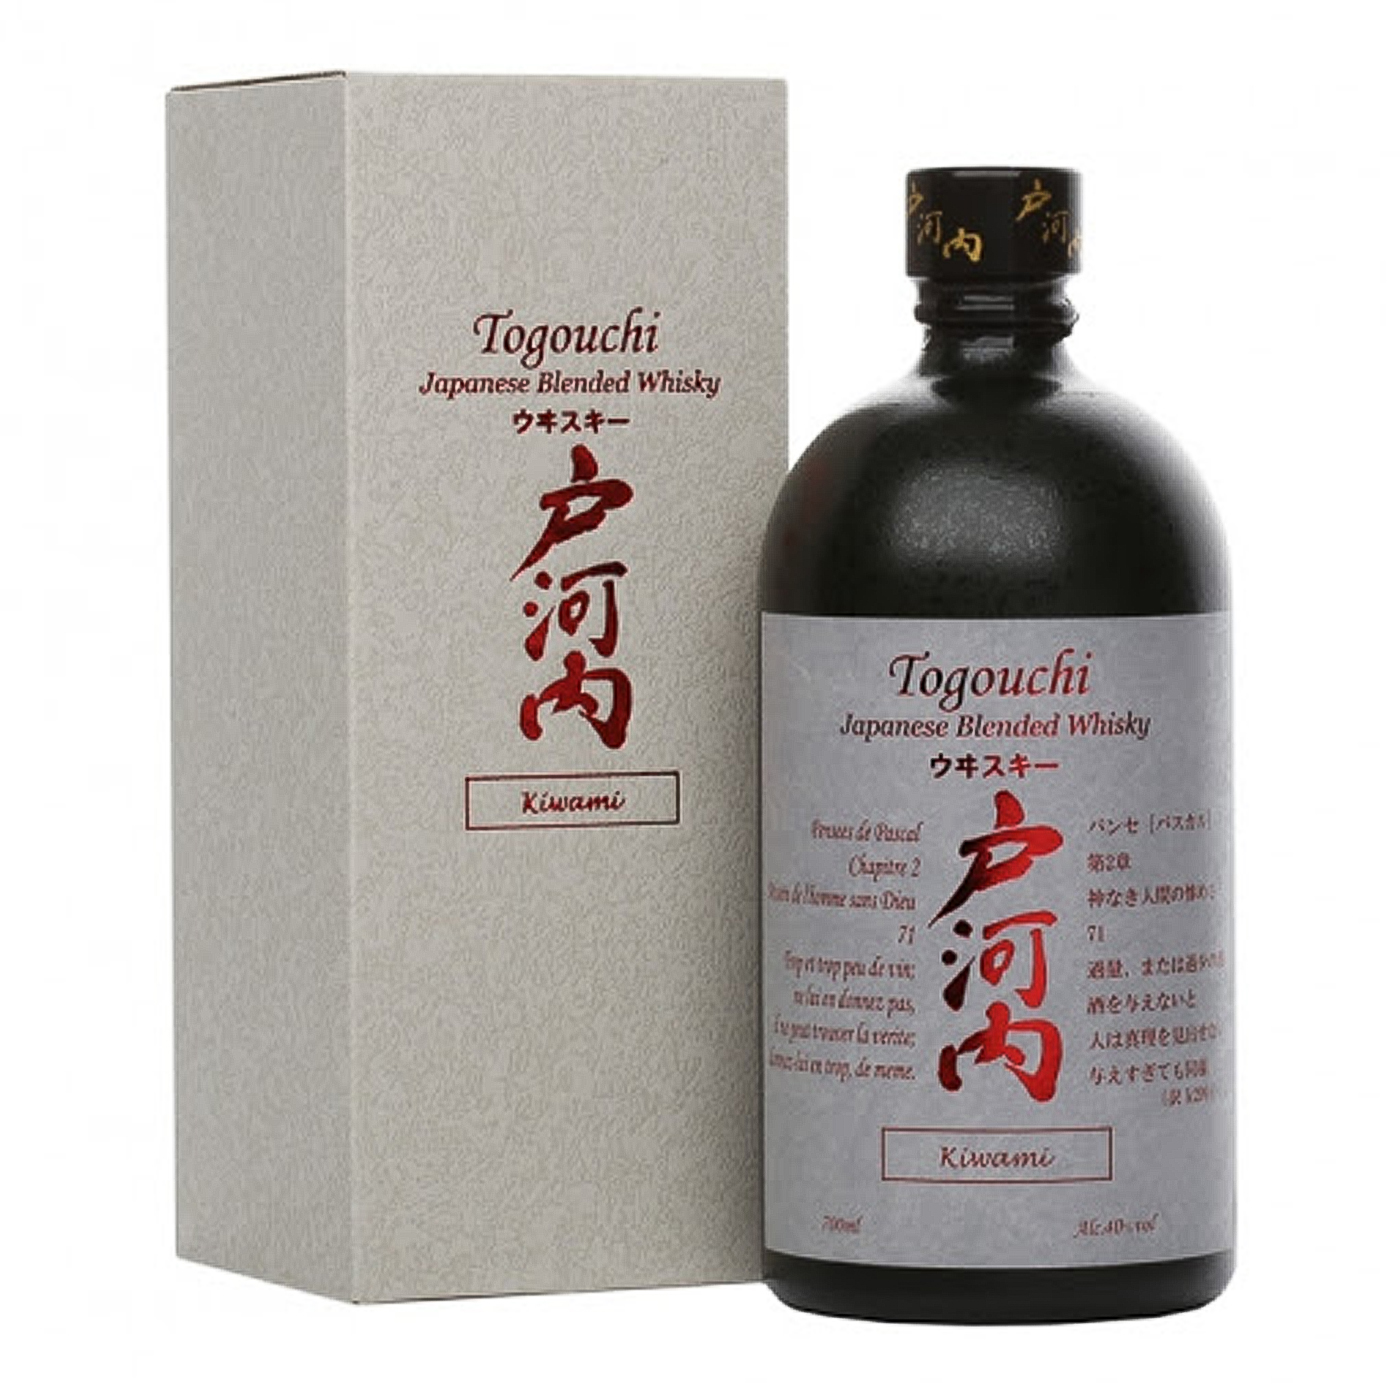 Togouchi Kiwami Japan Whisky